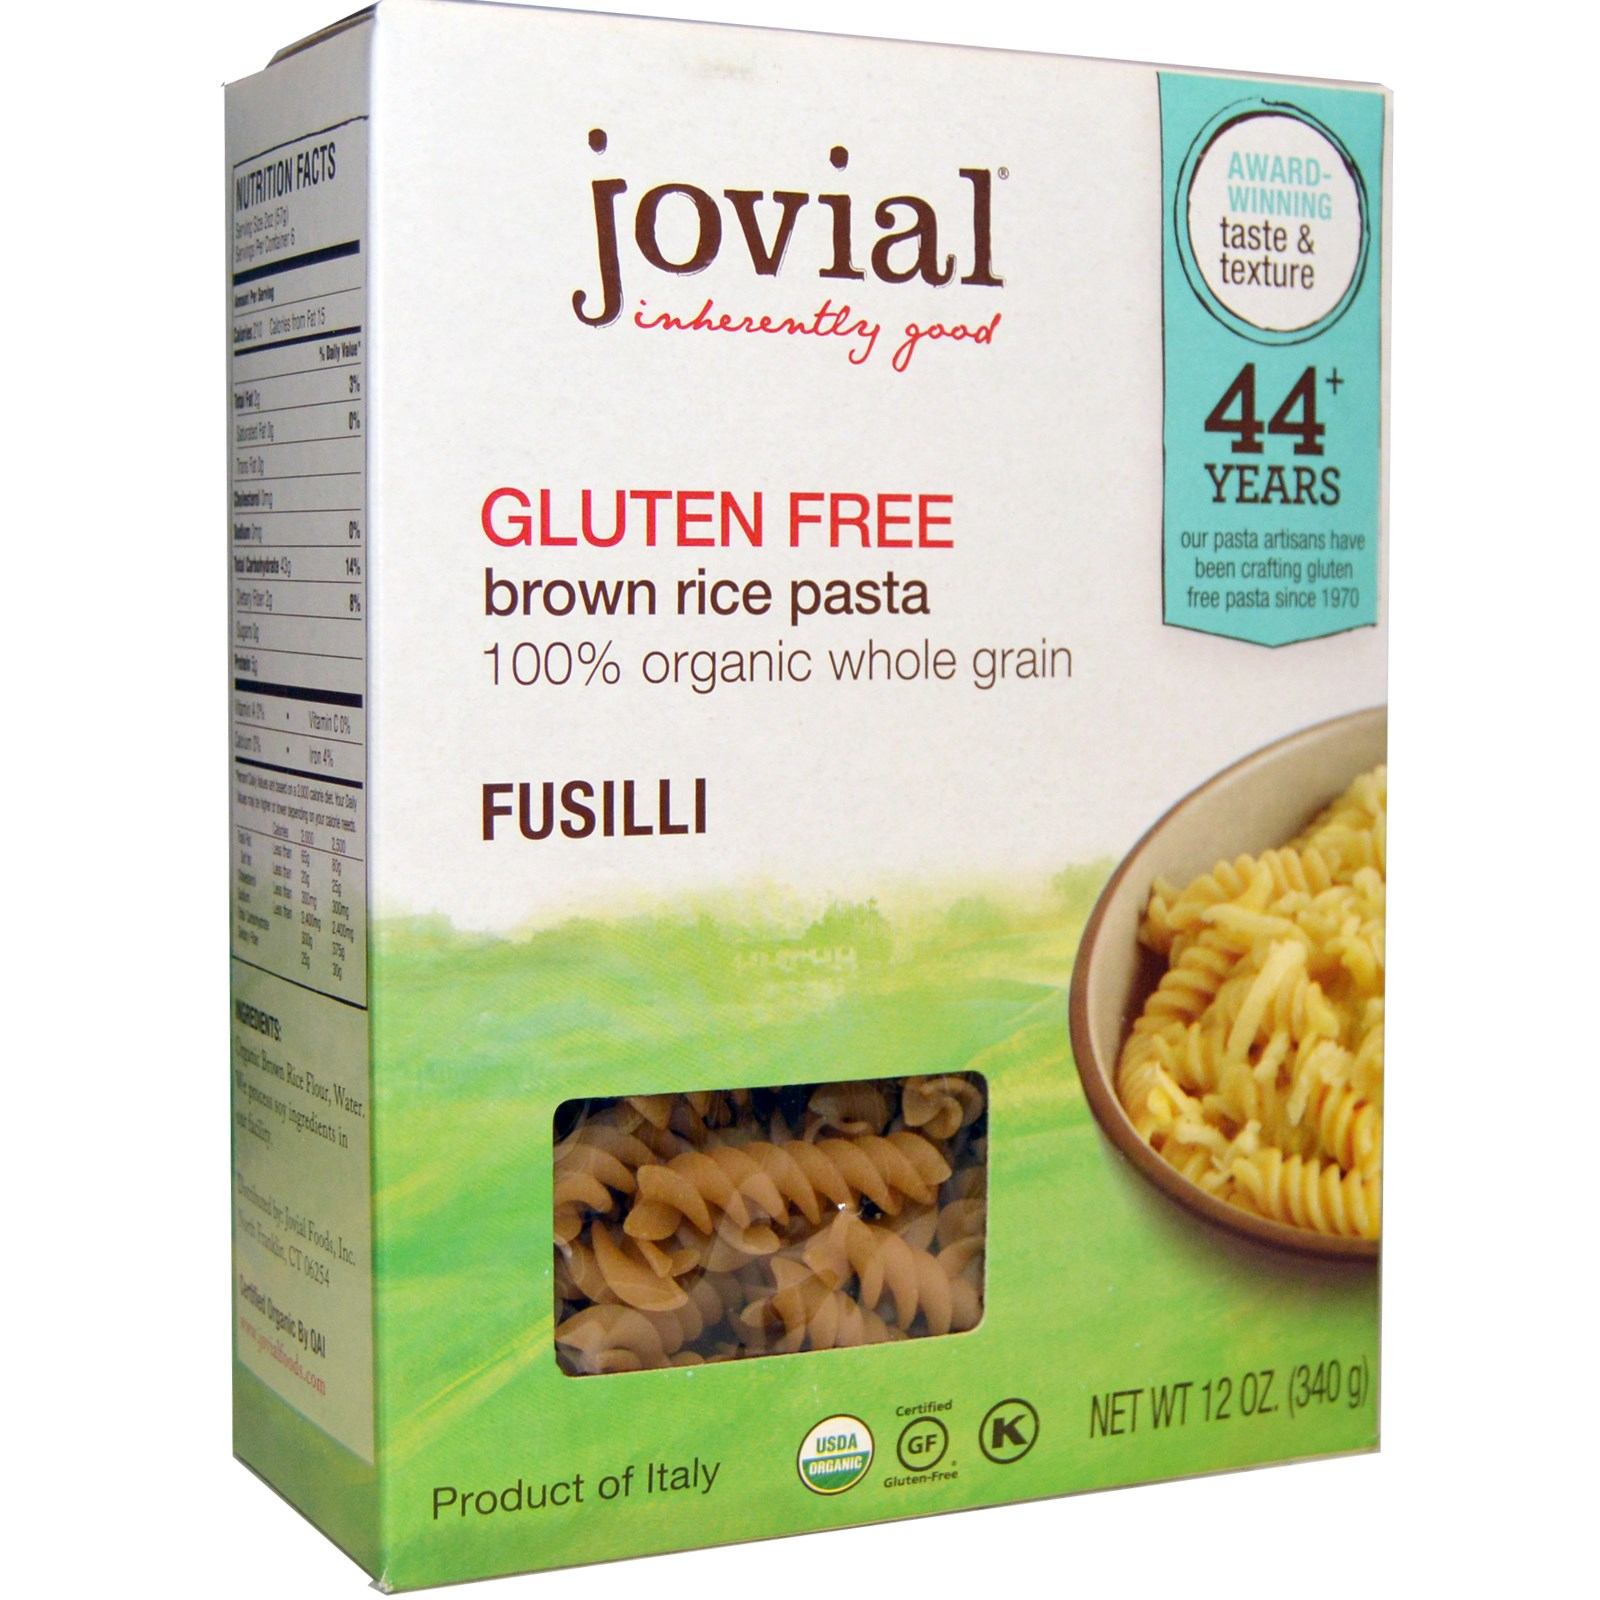 Jovial, Brown Rice Pasta, Fusilli, Gluten Free, 12 oz (pack of 4)